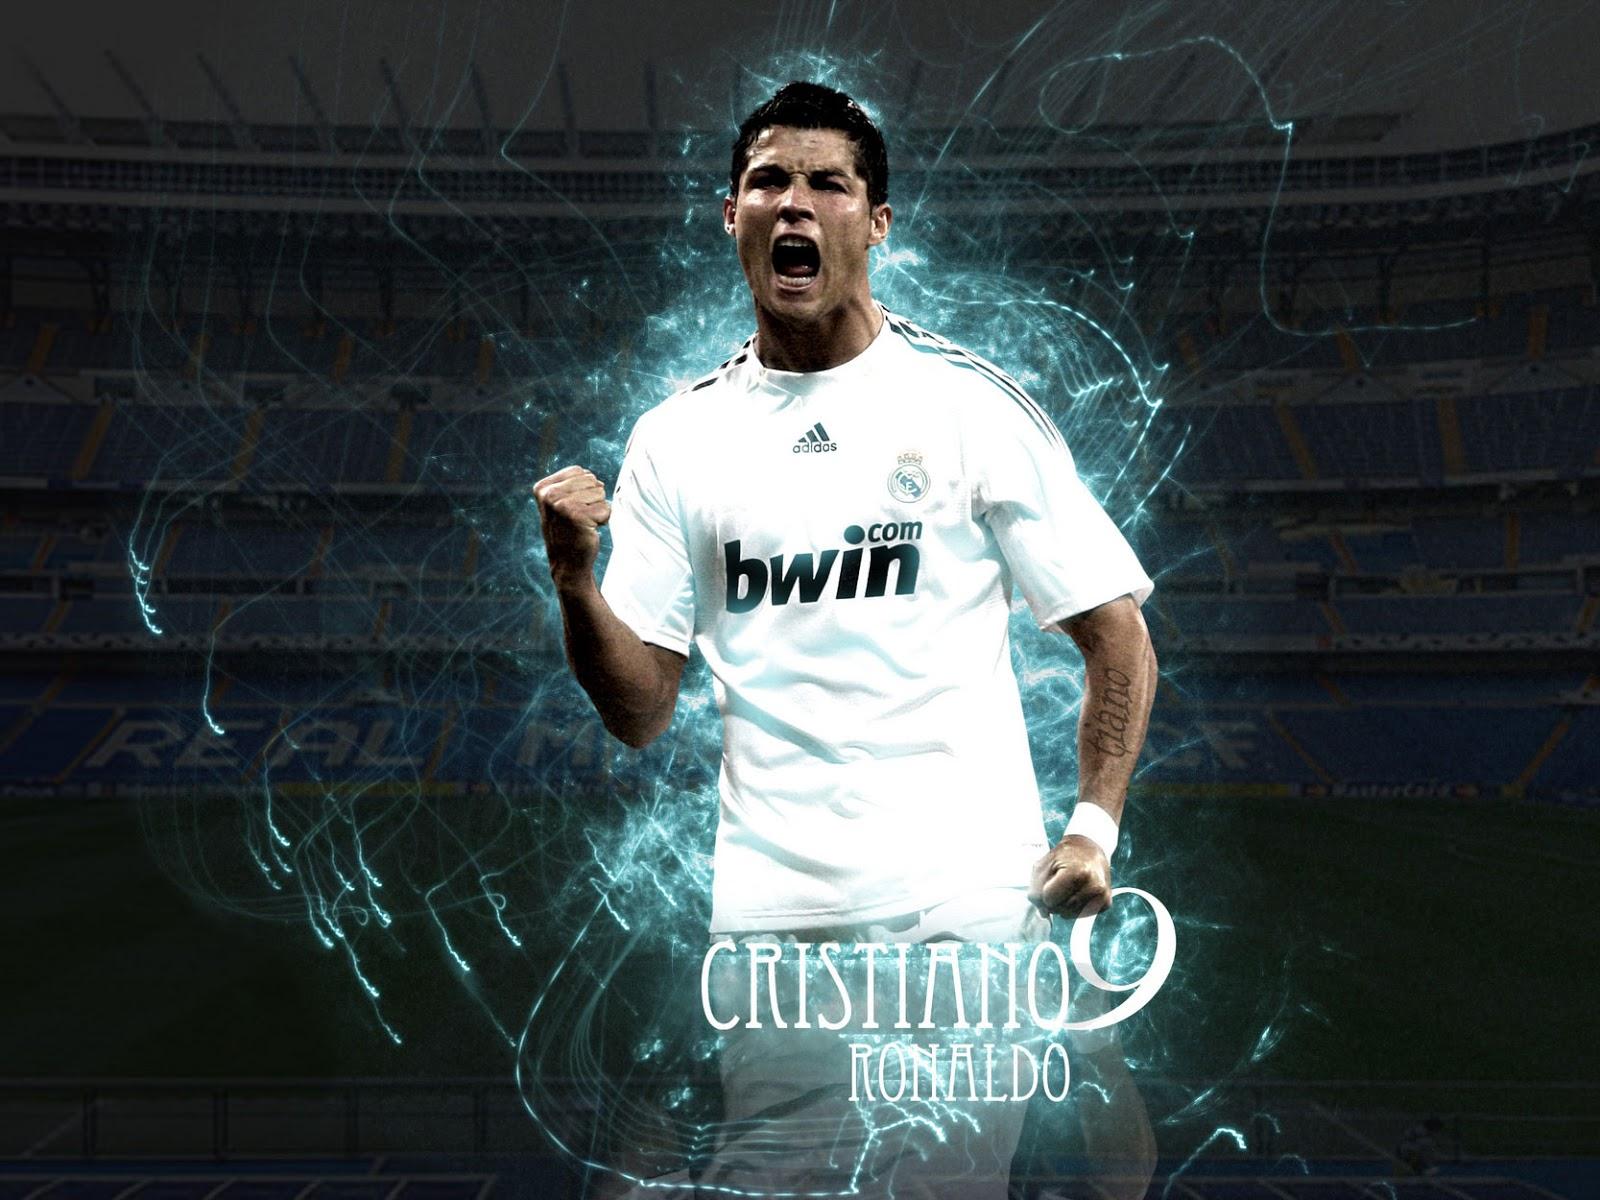 Free Download Cristiano Ronaldo Descargar Wallpapers Fondo